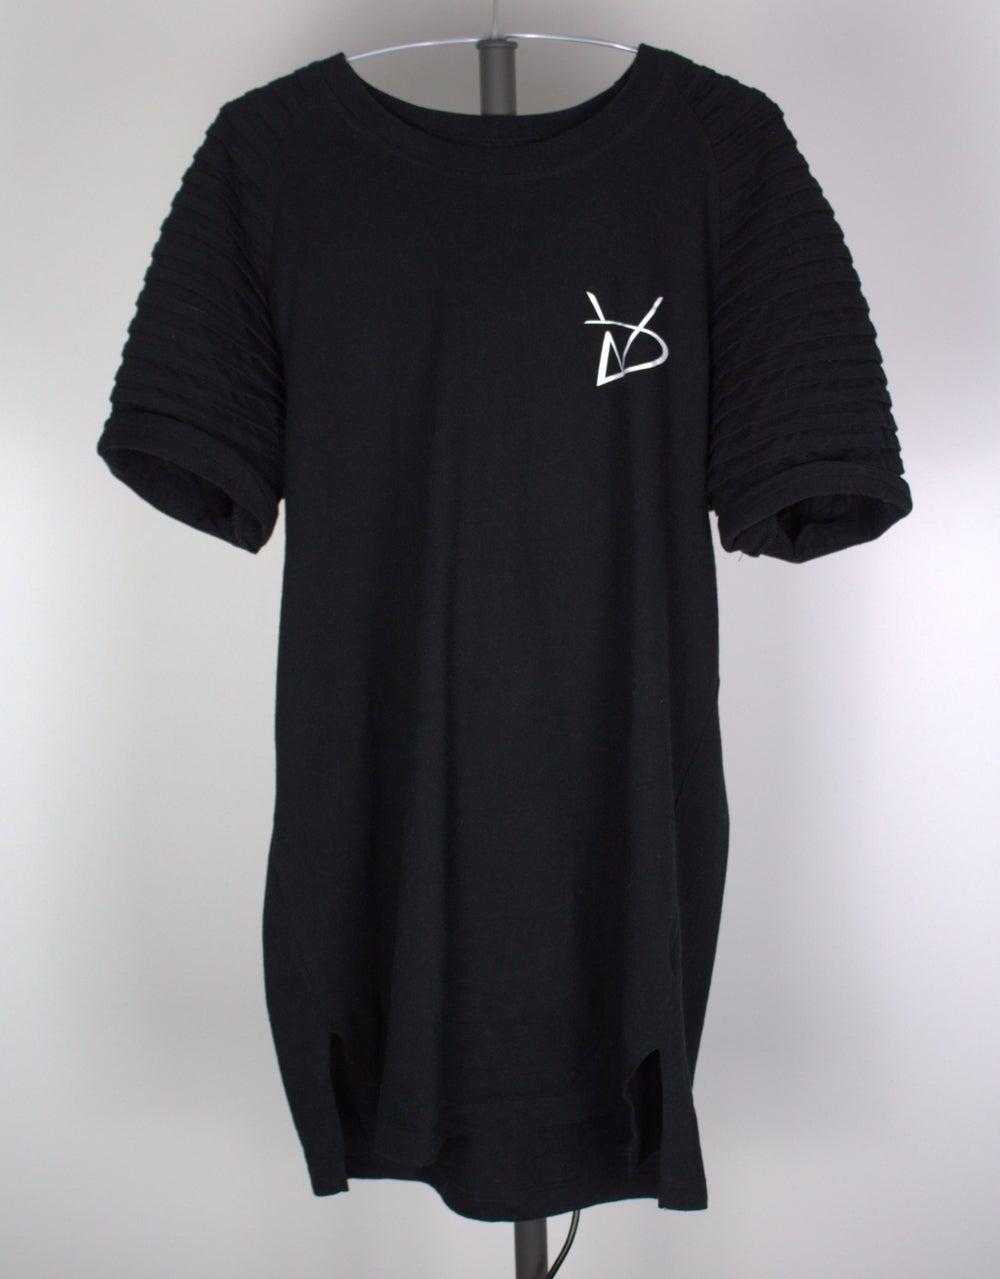 Image of Lion Shirt BLK/GRN